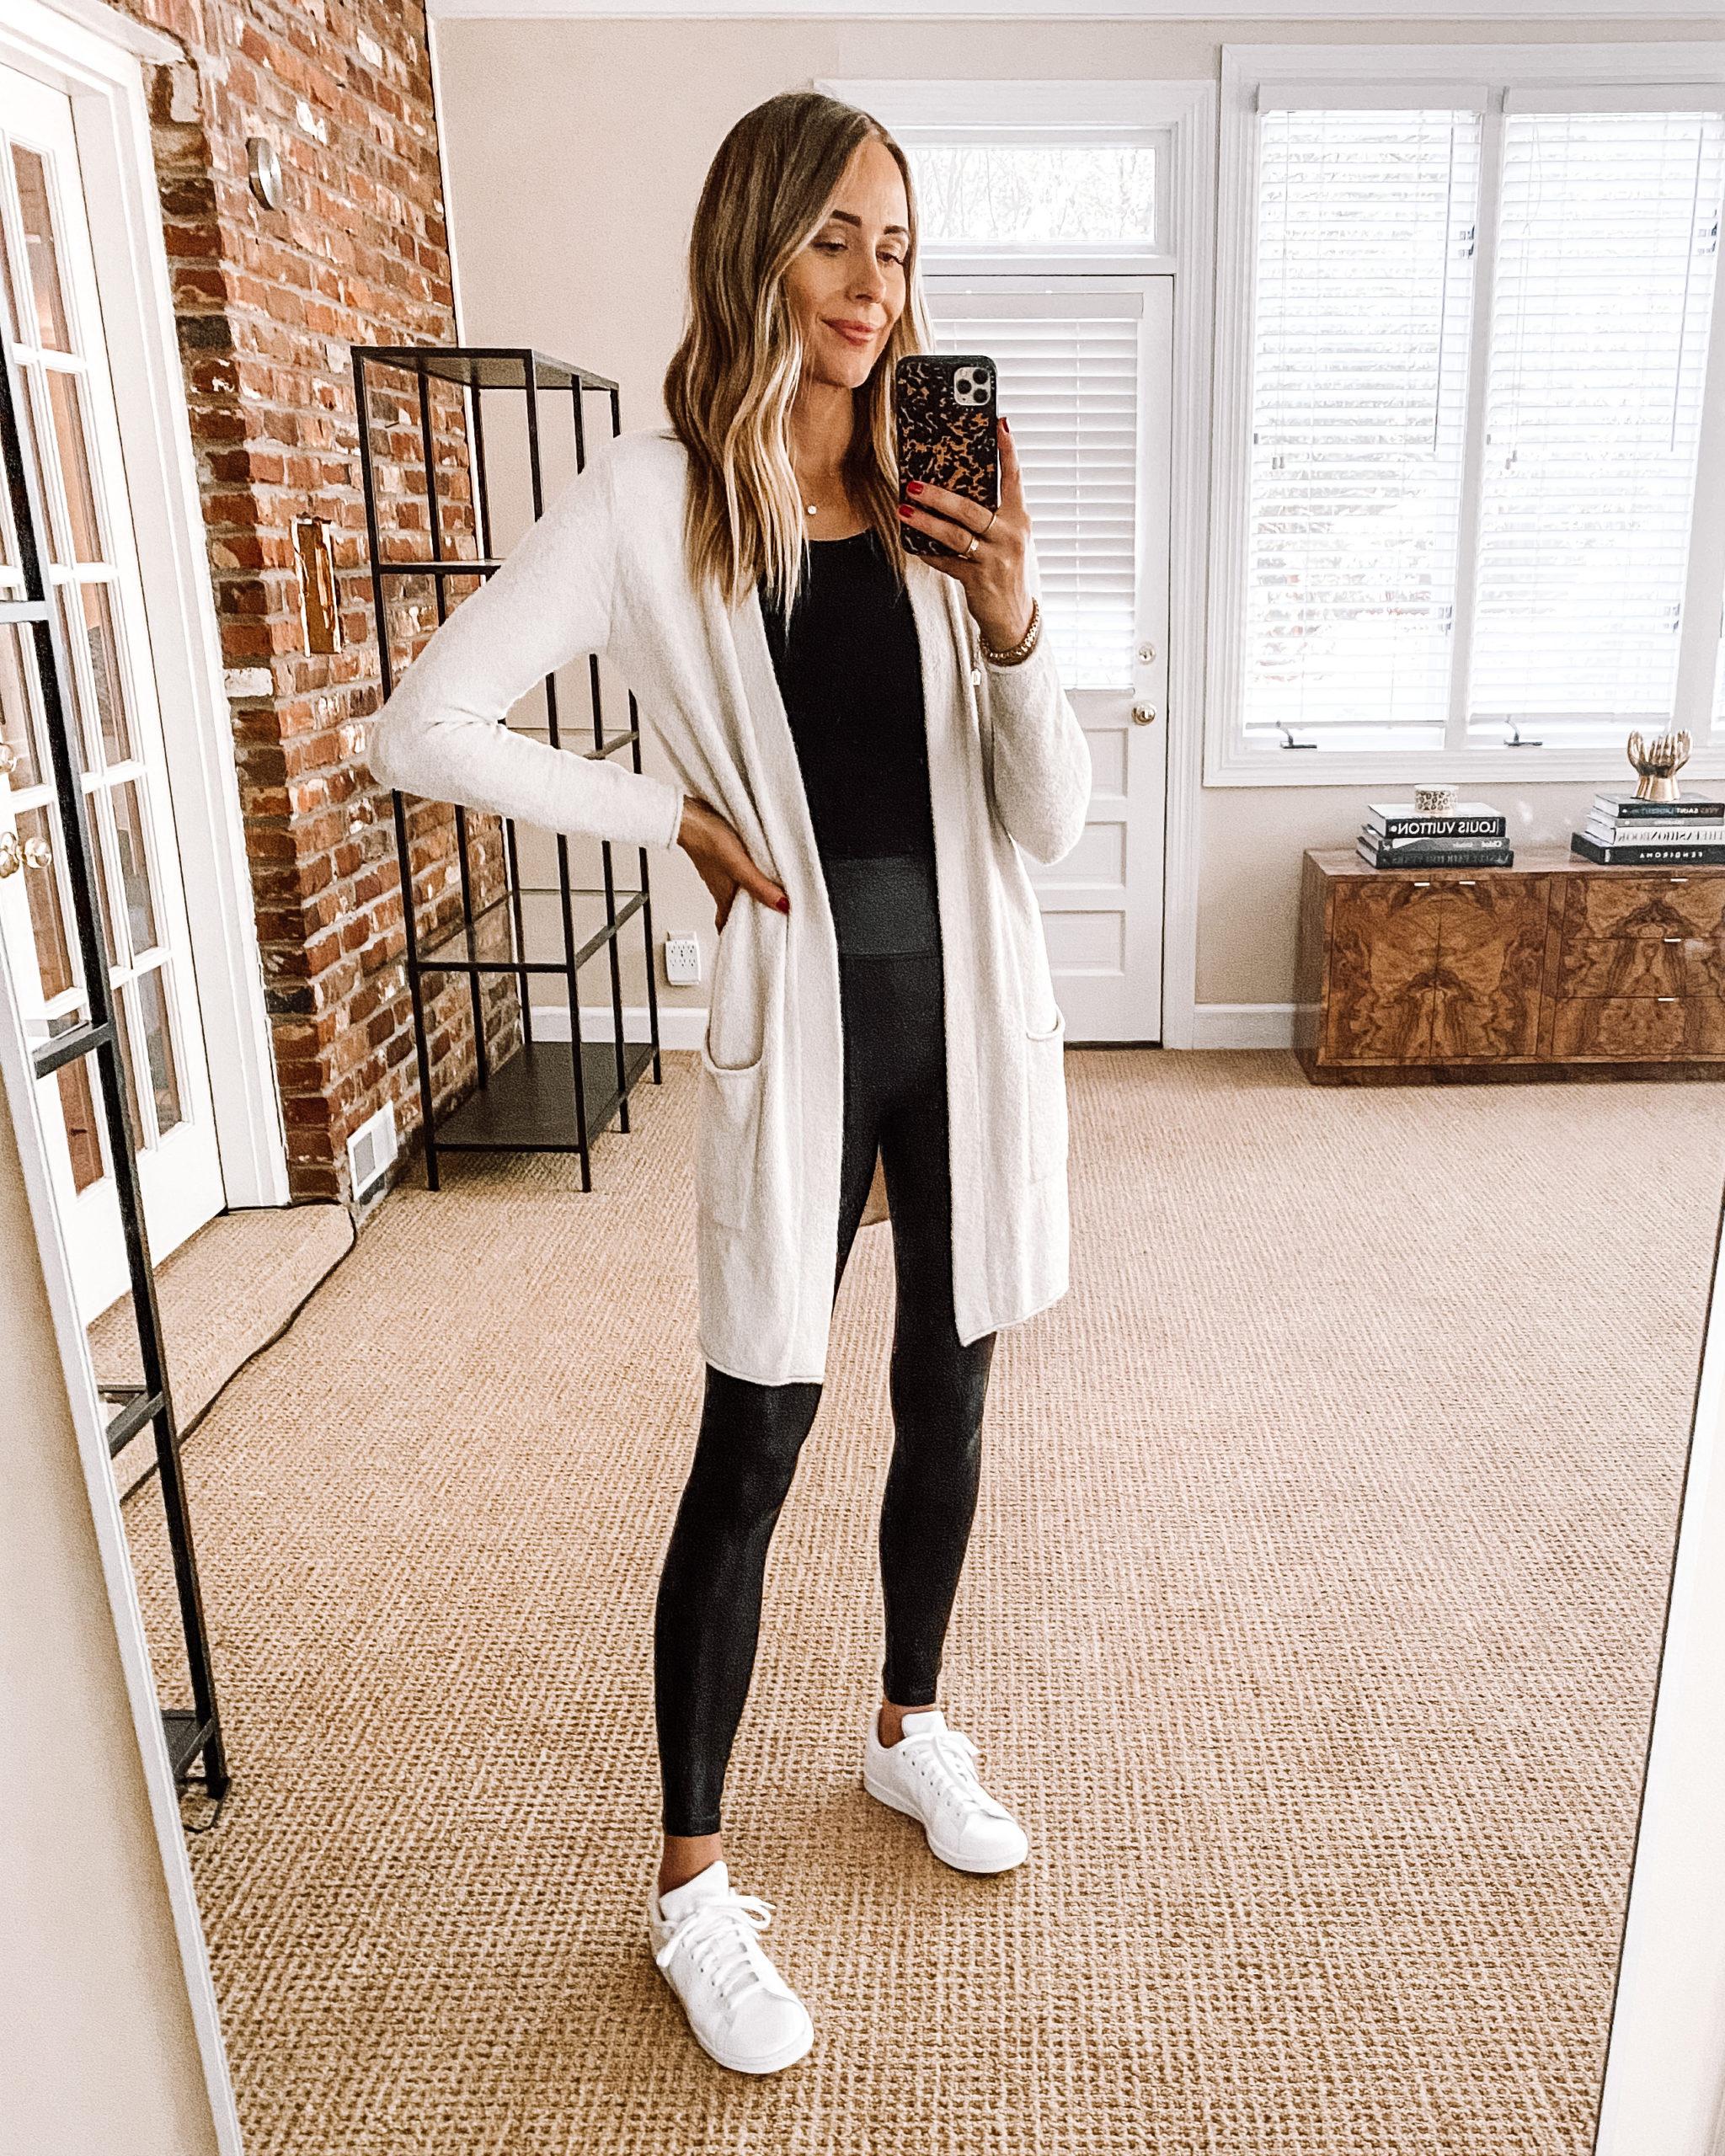 Fashion Jackson Nordstrom Anniversary Sale Barefoot Dreams Cardigan Black Bodysuit Black Spanx Leggings adidas White Sneakers